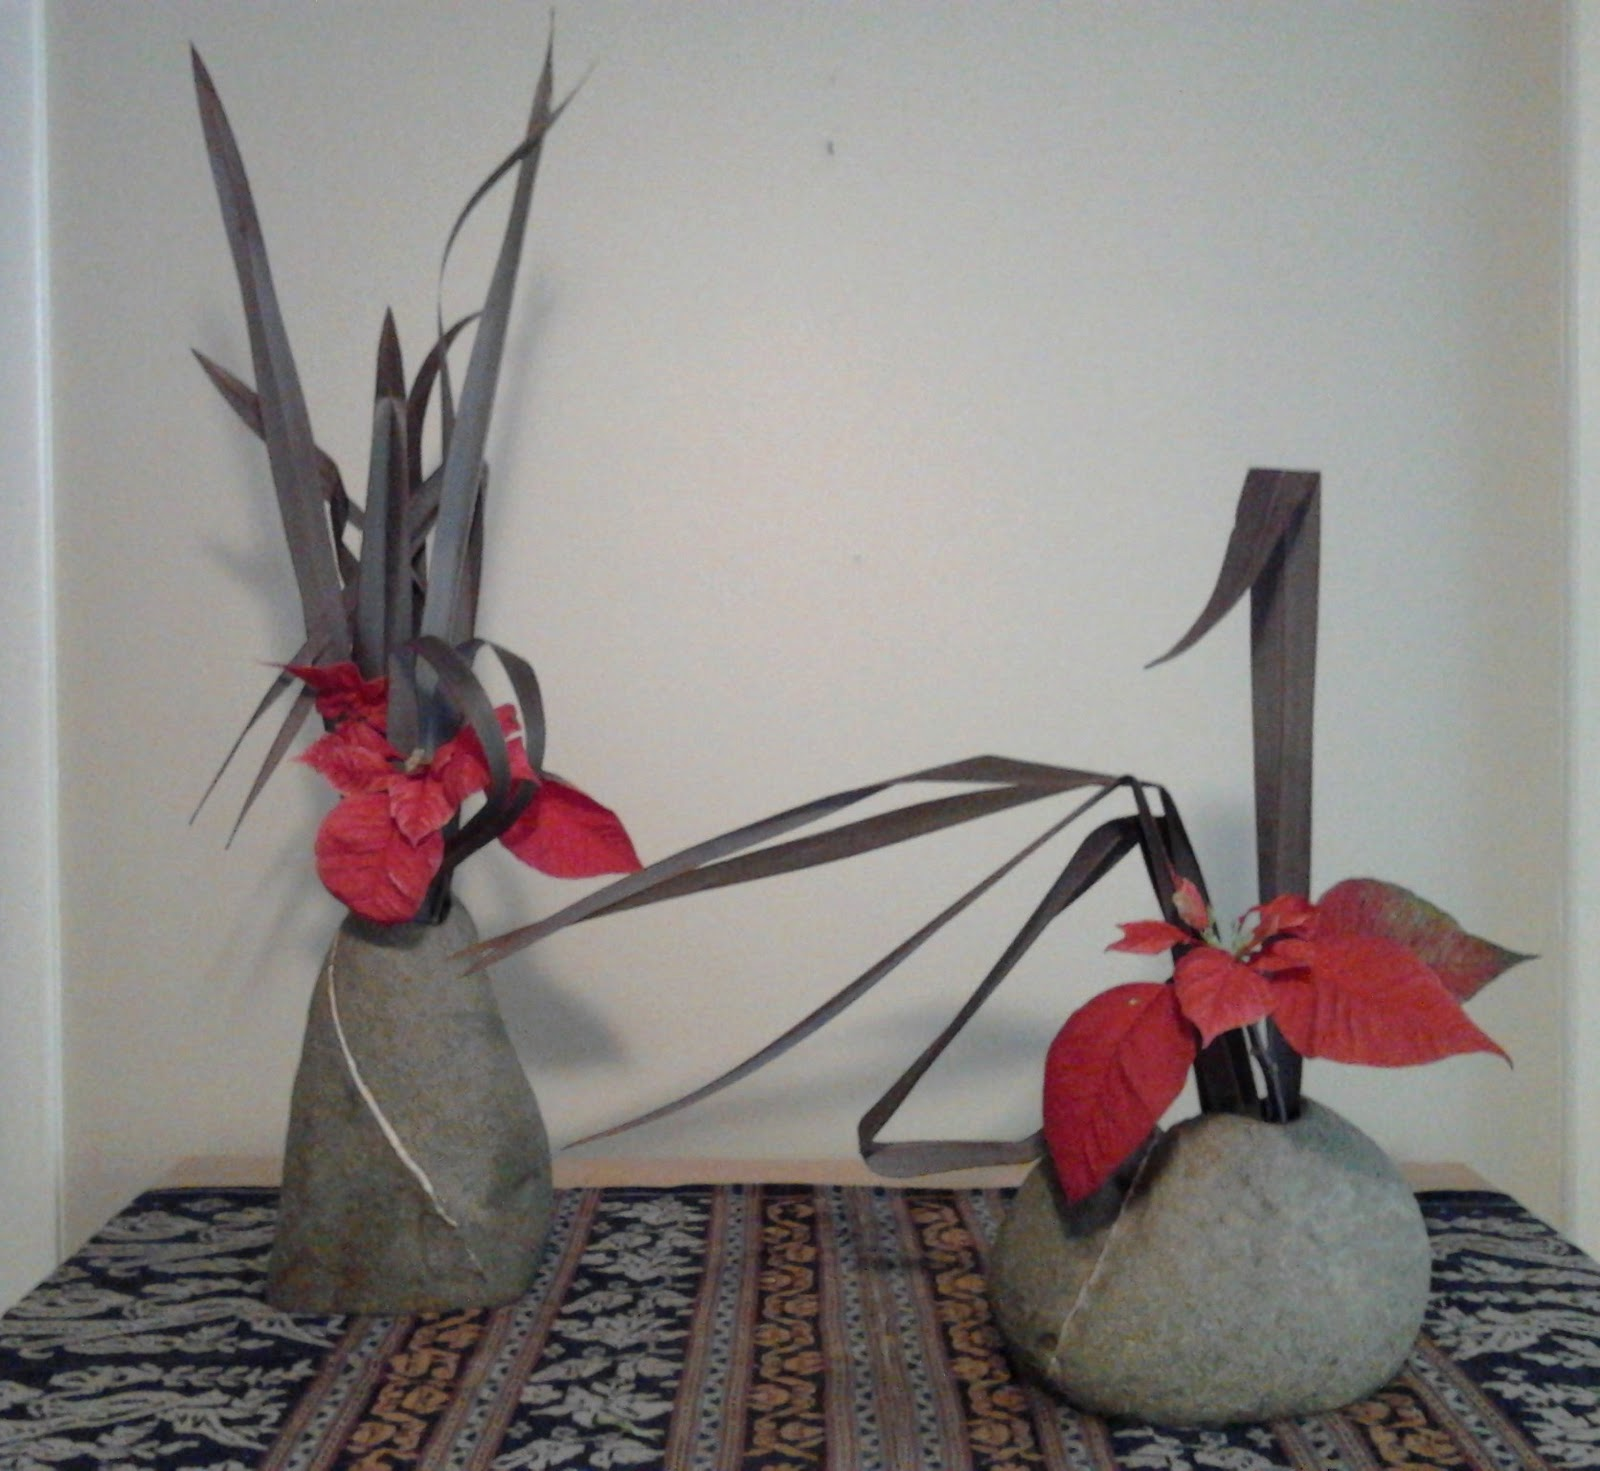 elizabeth berry ikebana freestyle composition with new. Black Bedroom Furniture Sets. Home Design Ideas